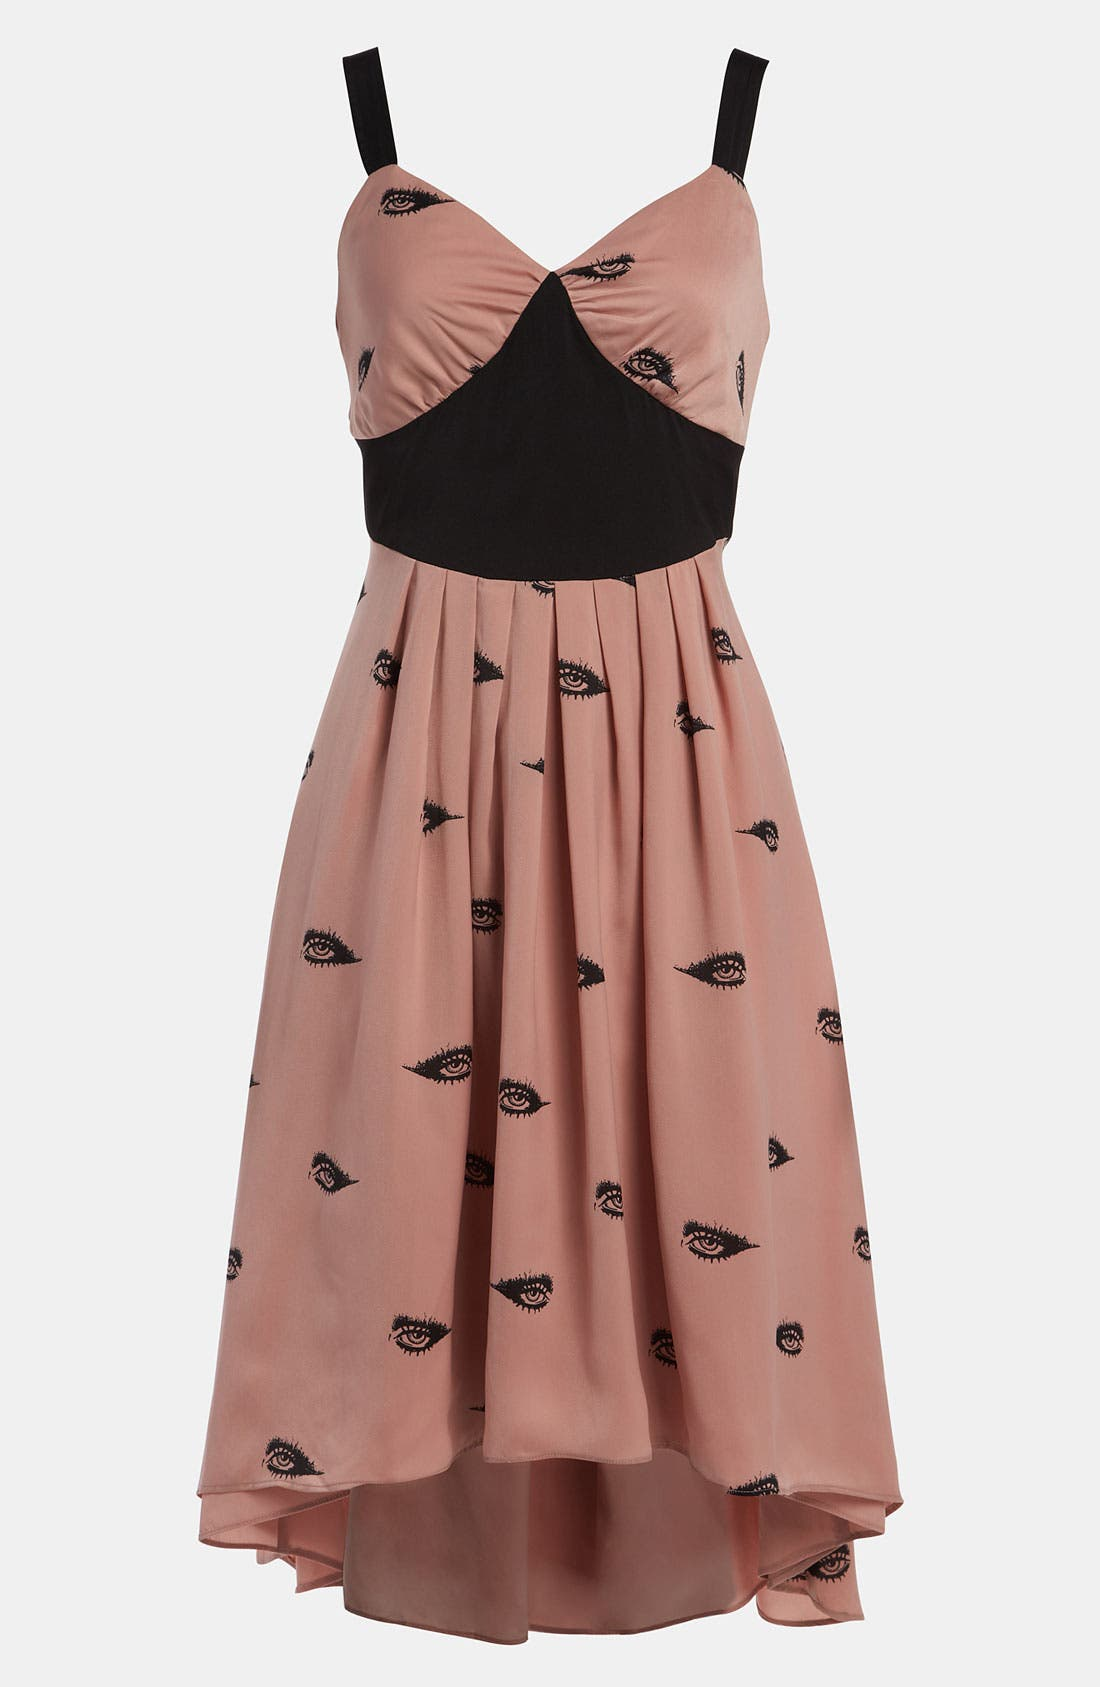 Alternate Image 1 Selected - Viva Vena! Print Dress